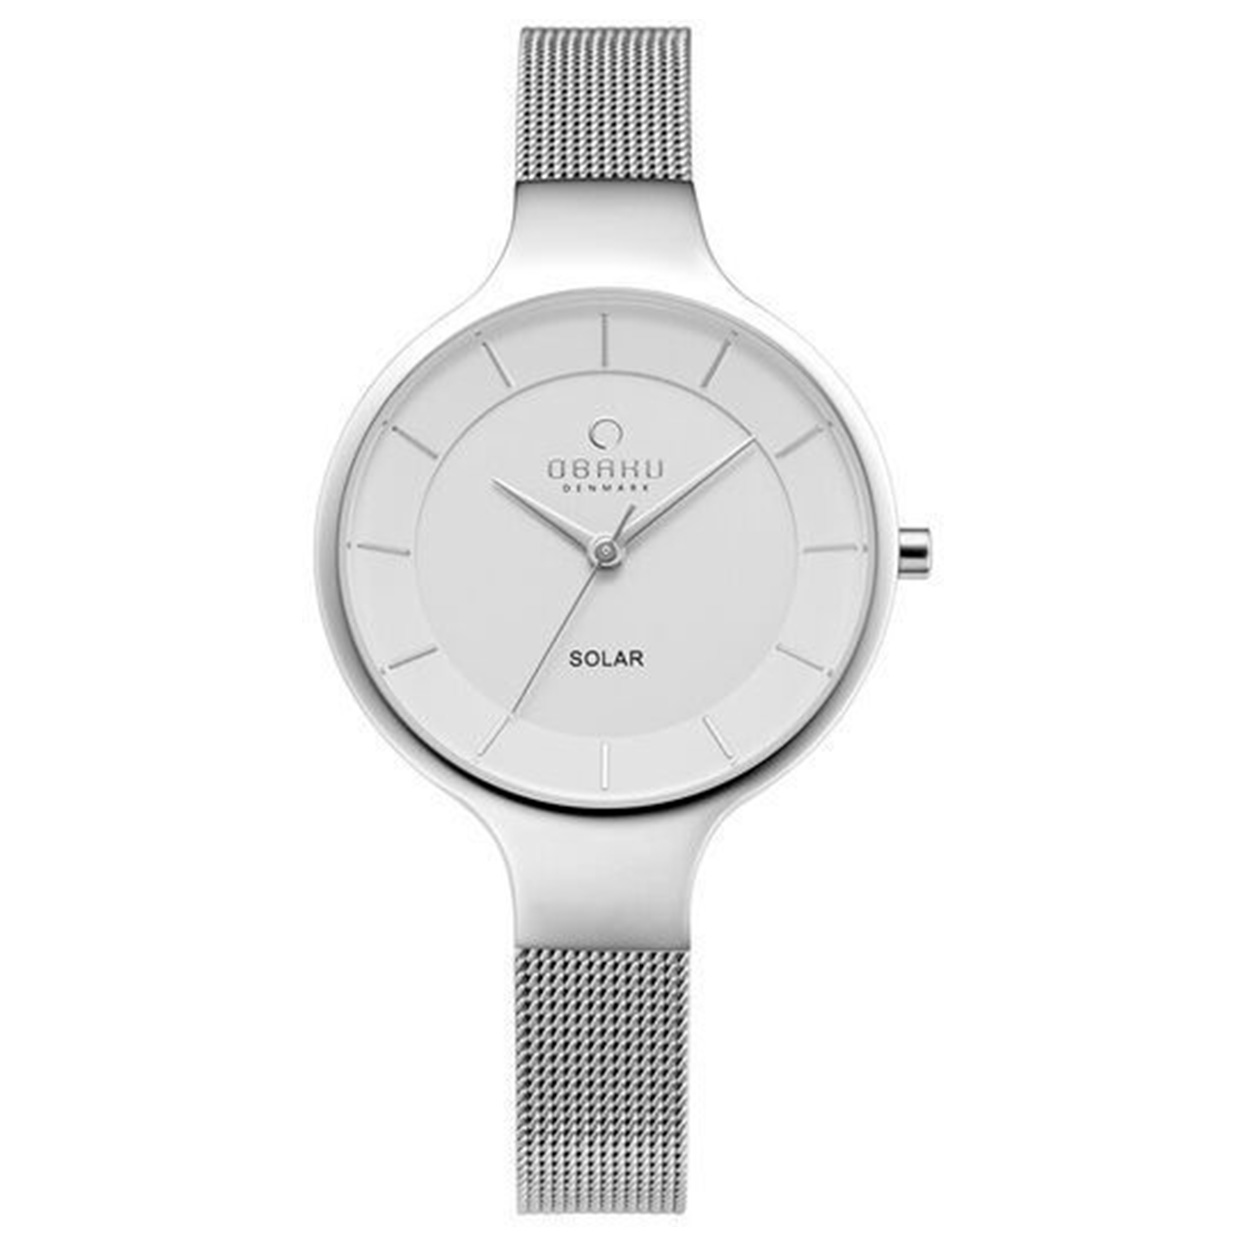 Zegarek Obaku V221LRCWMC - grawer na stalowej kopercie